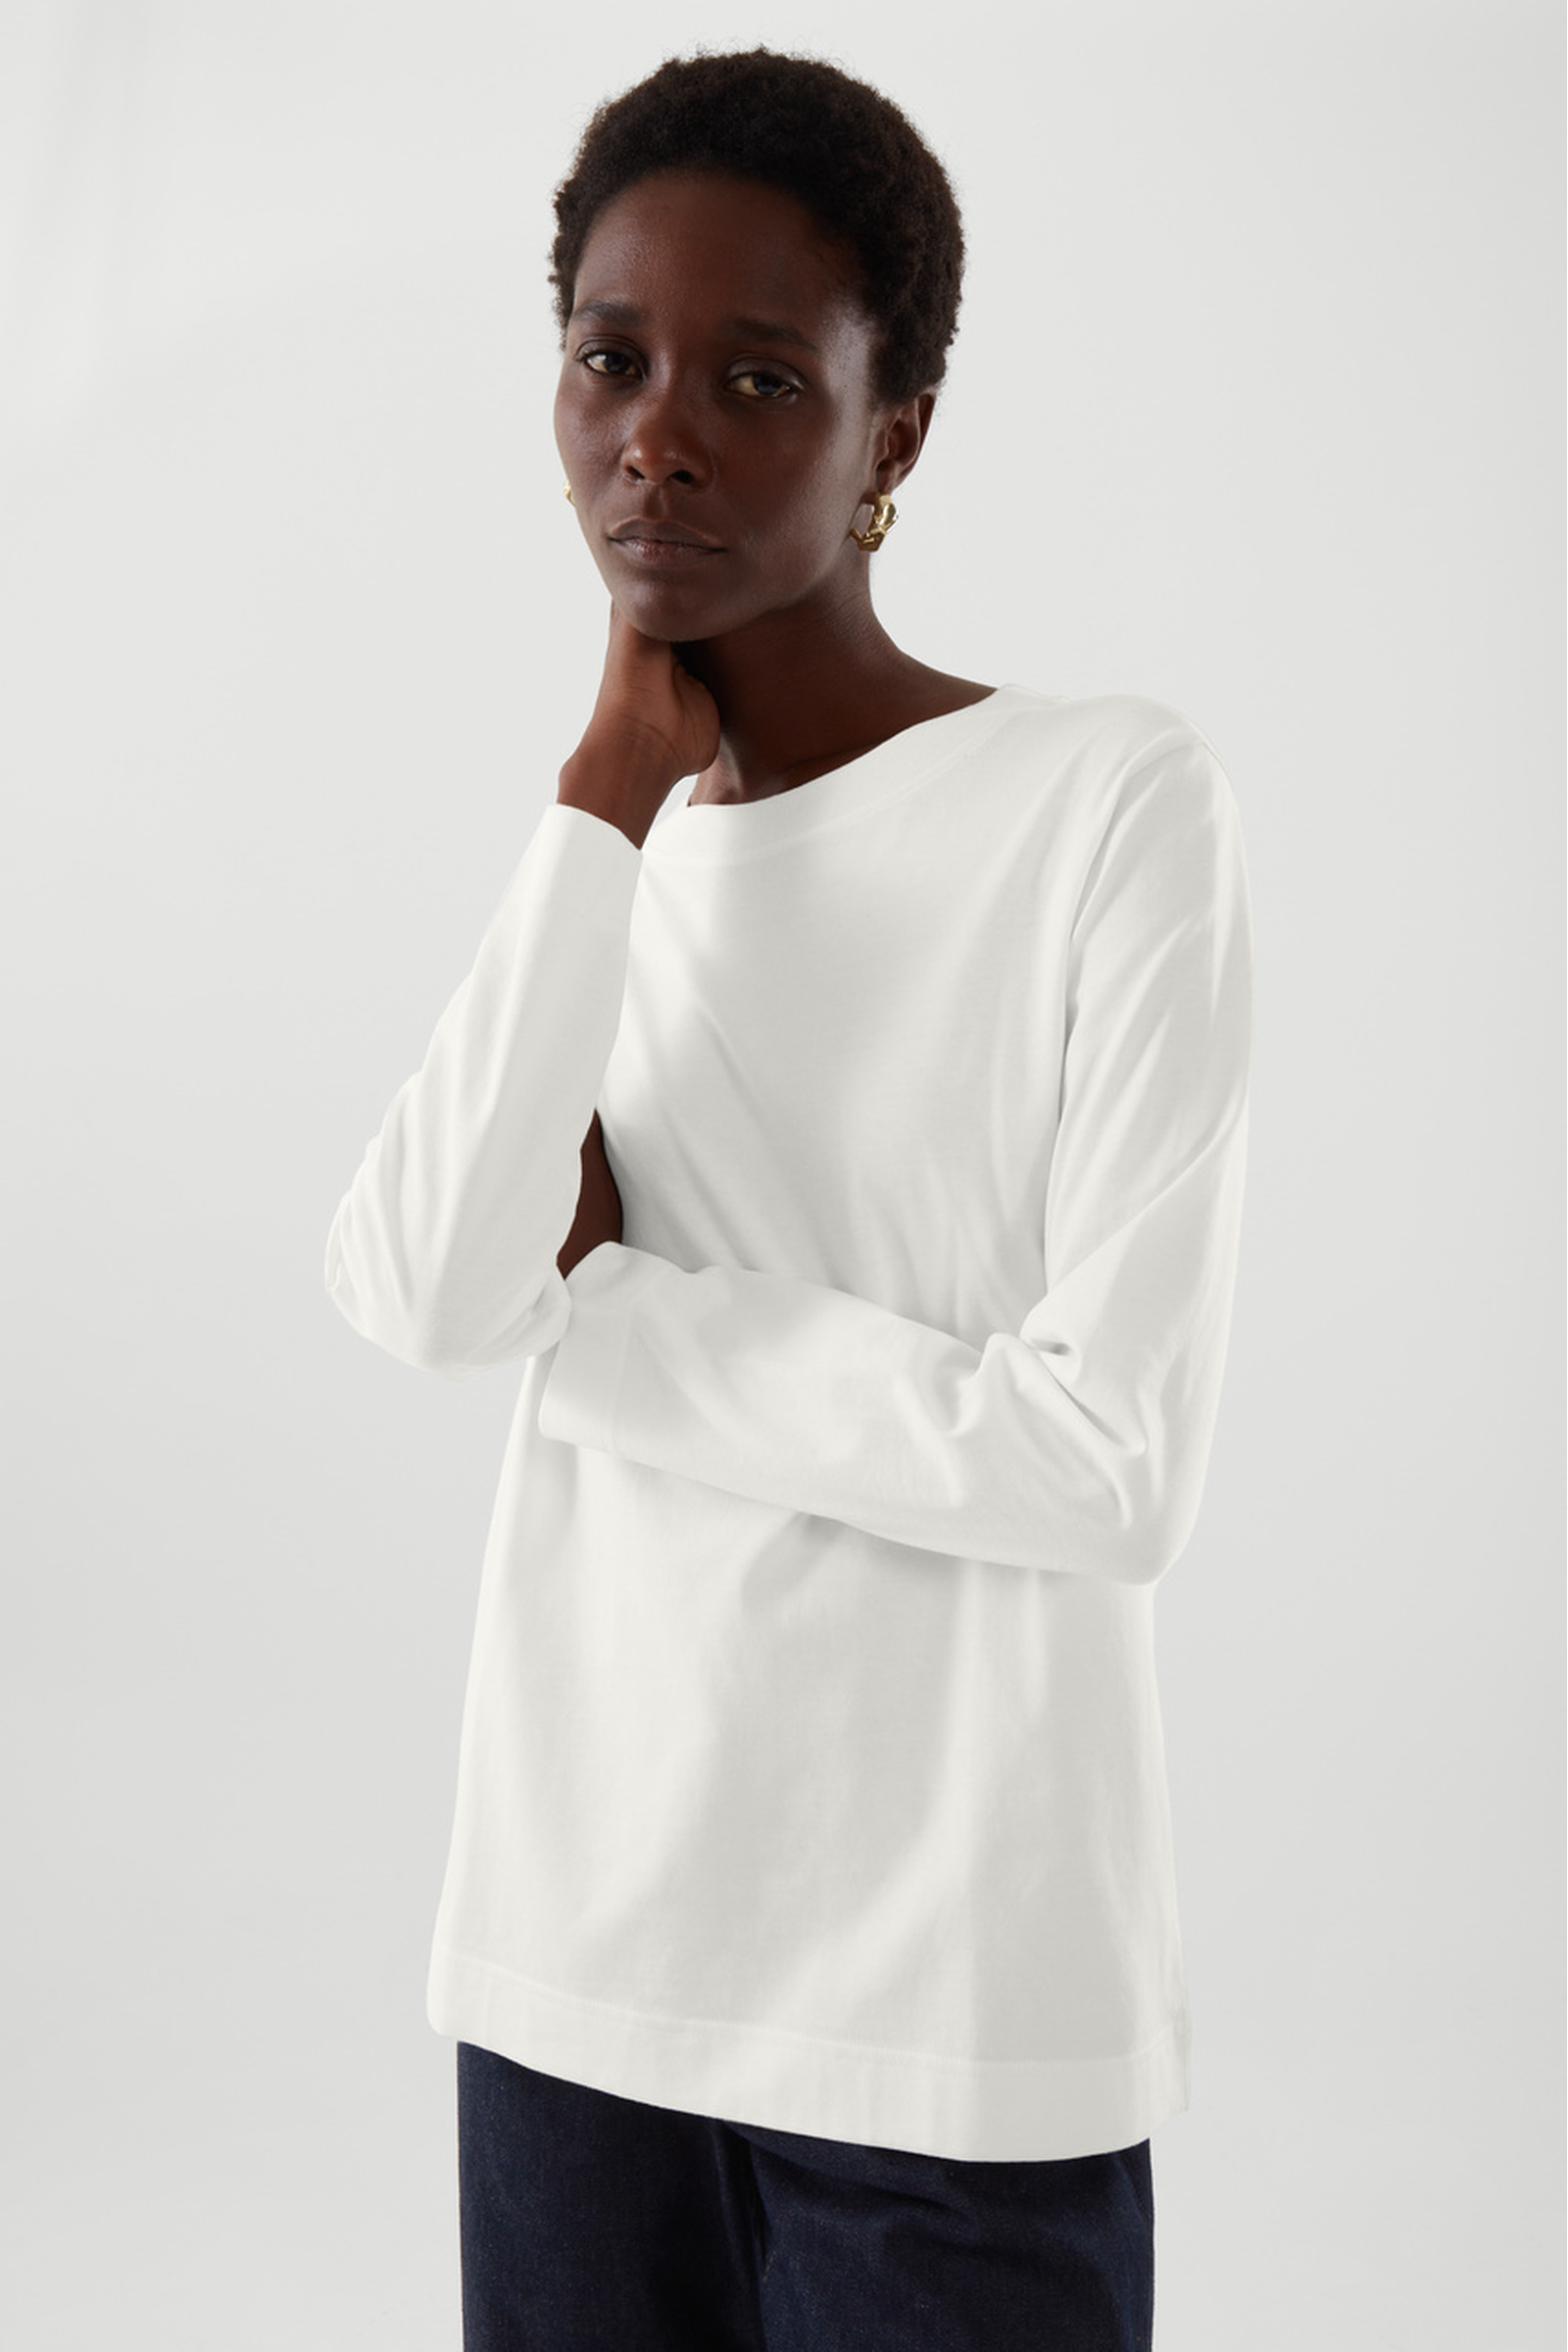 COS 와이드 넥 롱 슬리브 티셔츠의 화이트컬러 ECOMLook입니다.